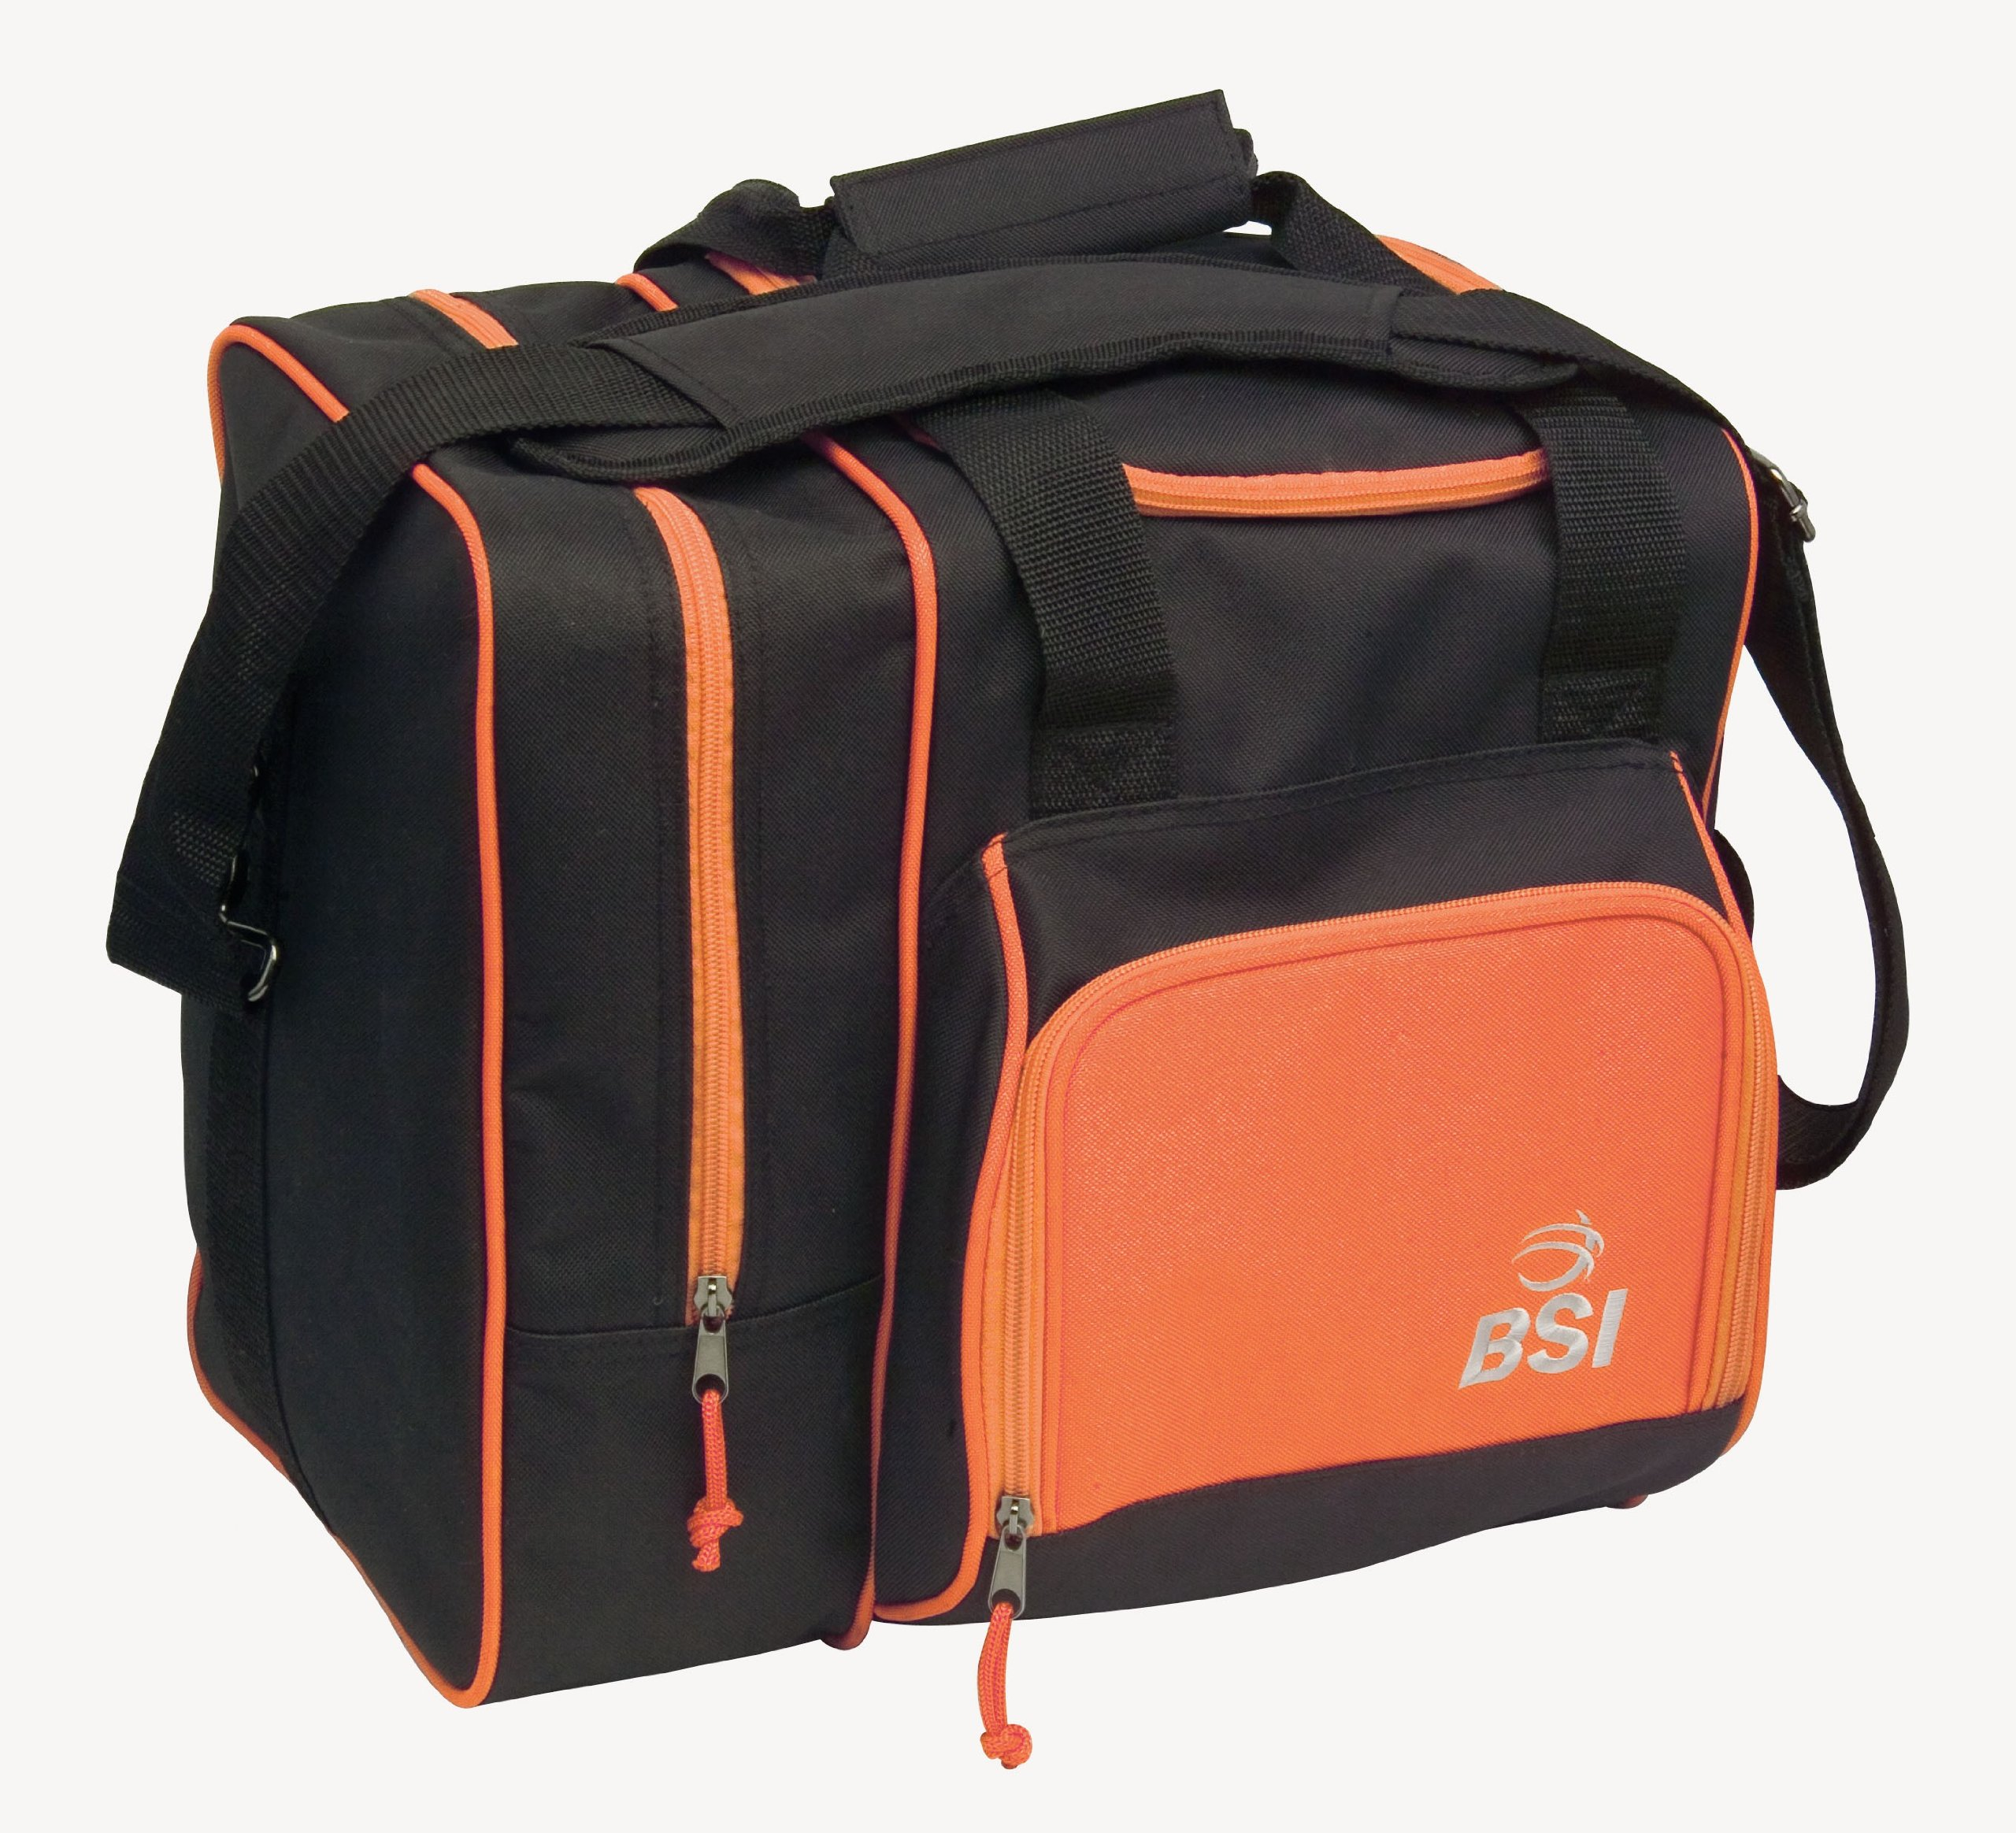 BSI Deluxe Single Ball Tote Bag (Black/Orange) by BSI